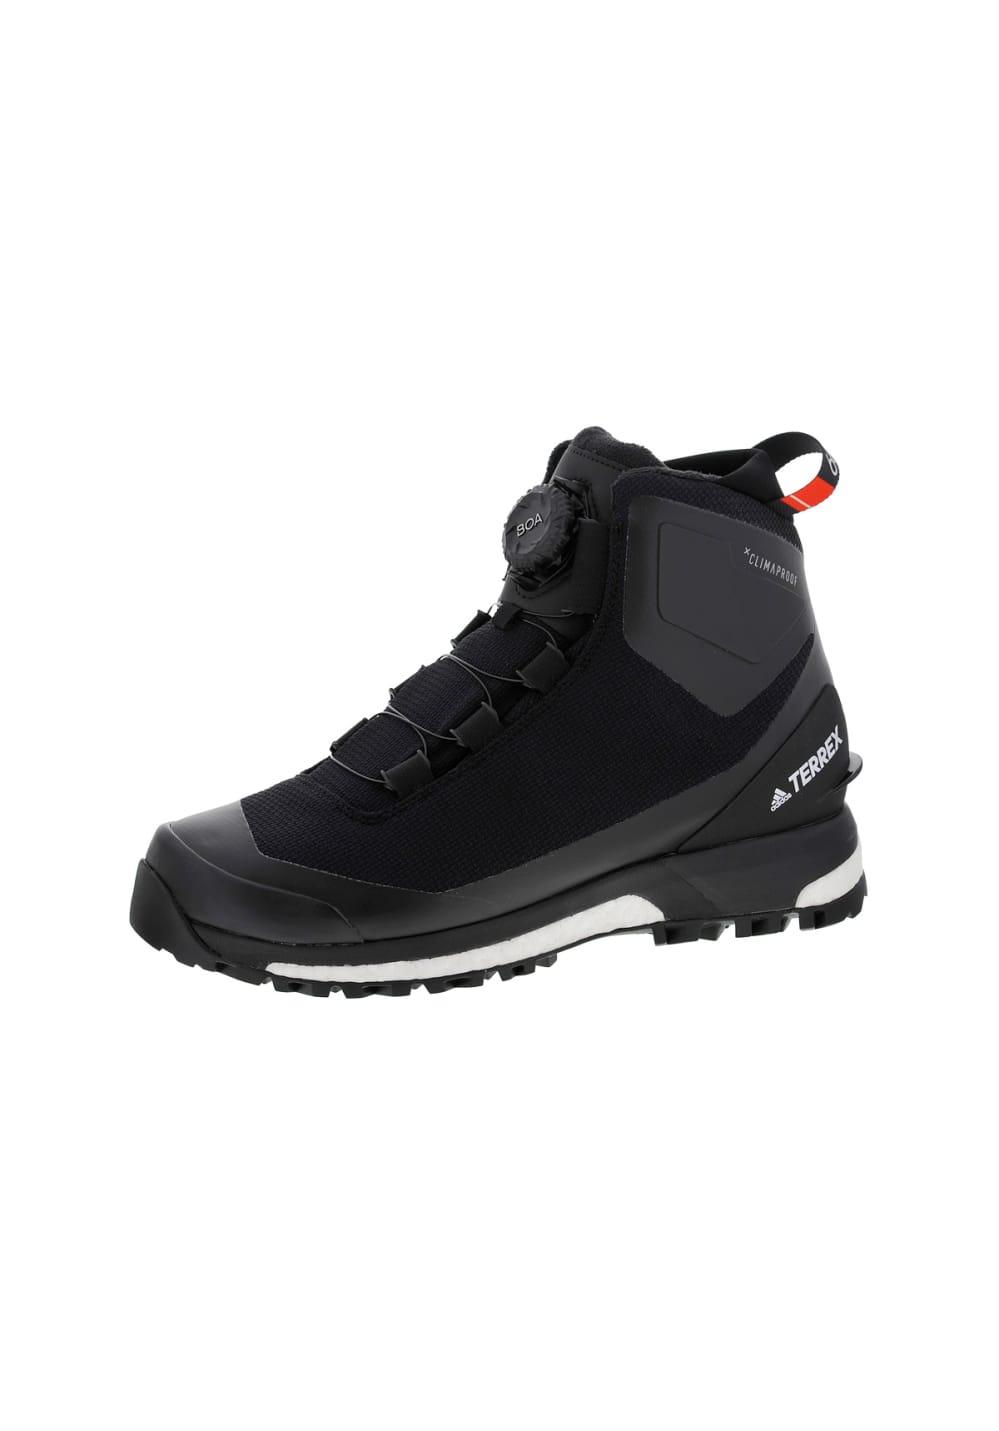 Adidas Pour Noir Boa Homme Conrax Terrex Randonnée Chaussures Climaheat OXlZPuTwki